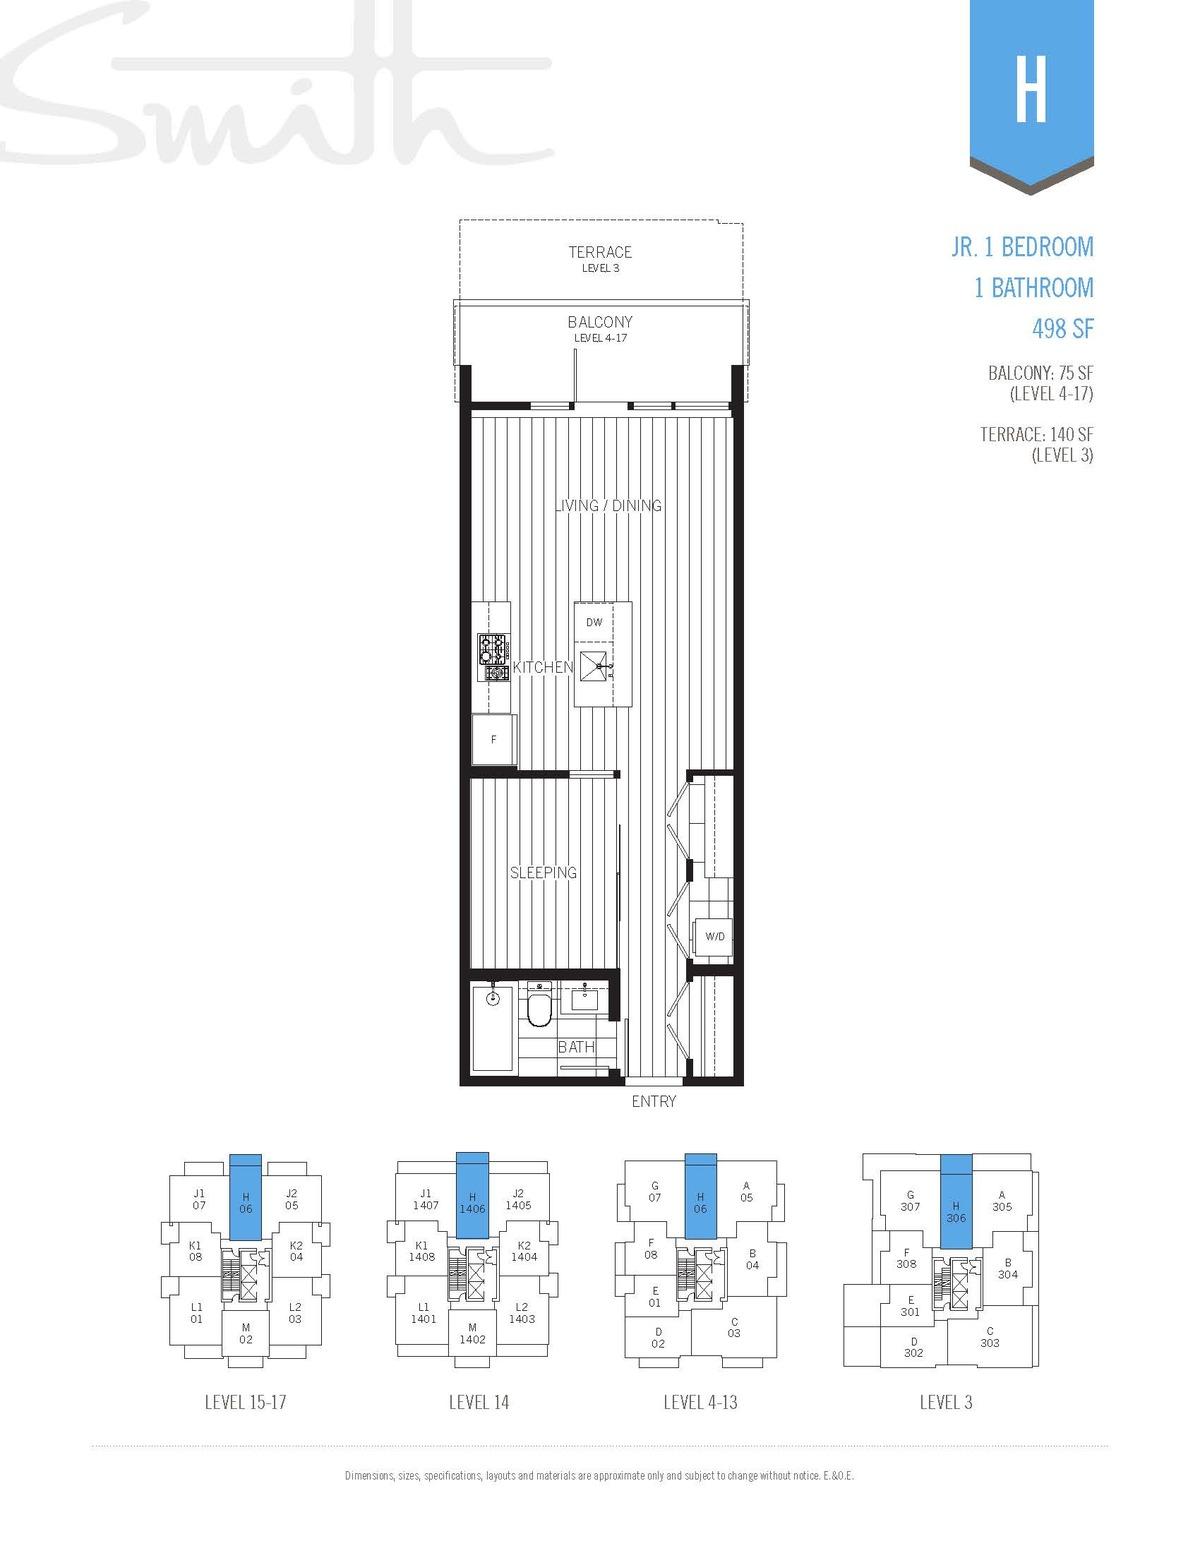 Smith Floorplan H